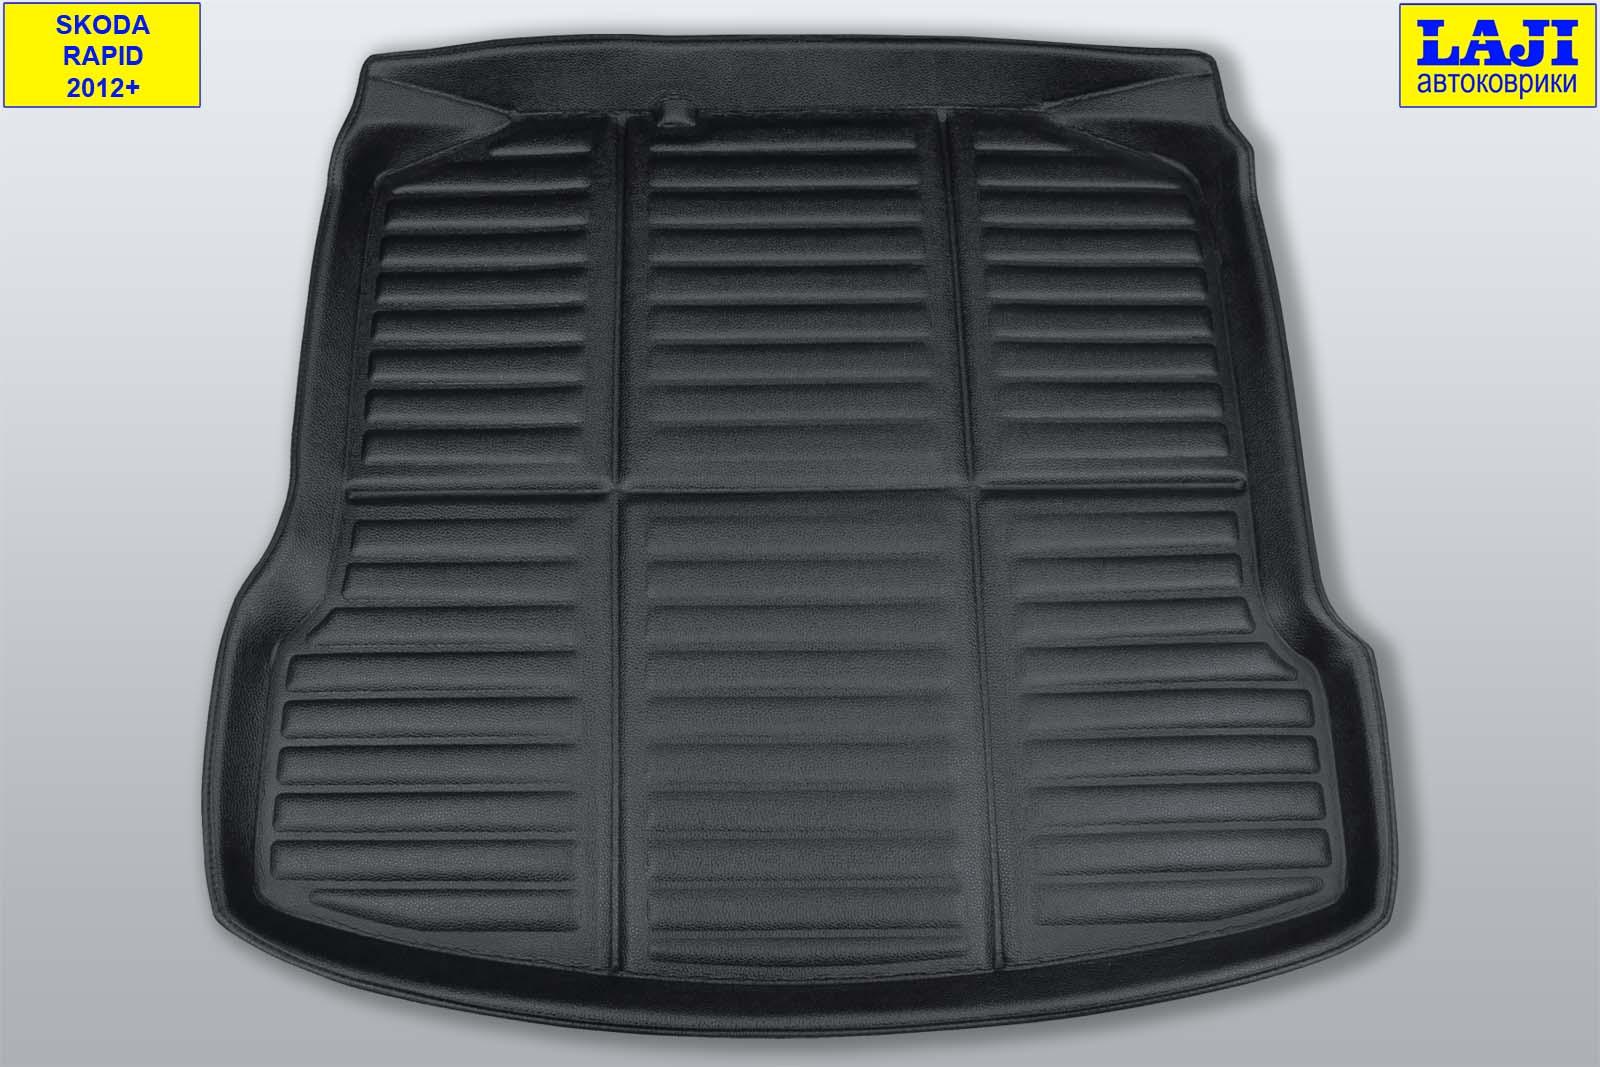 3D коврик в багажник Skoda Rapid 1 2012-2020 1